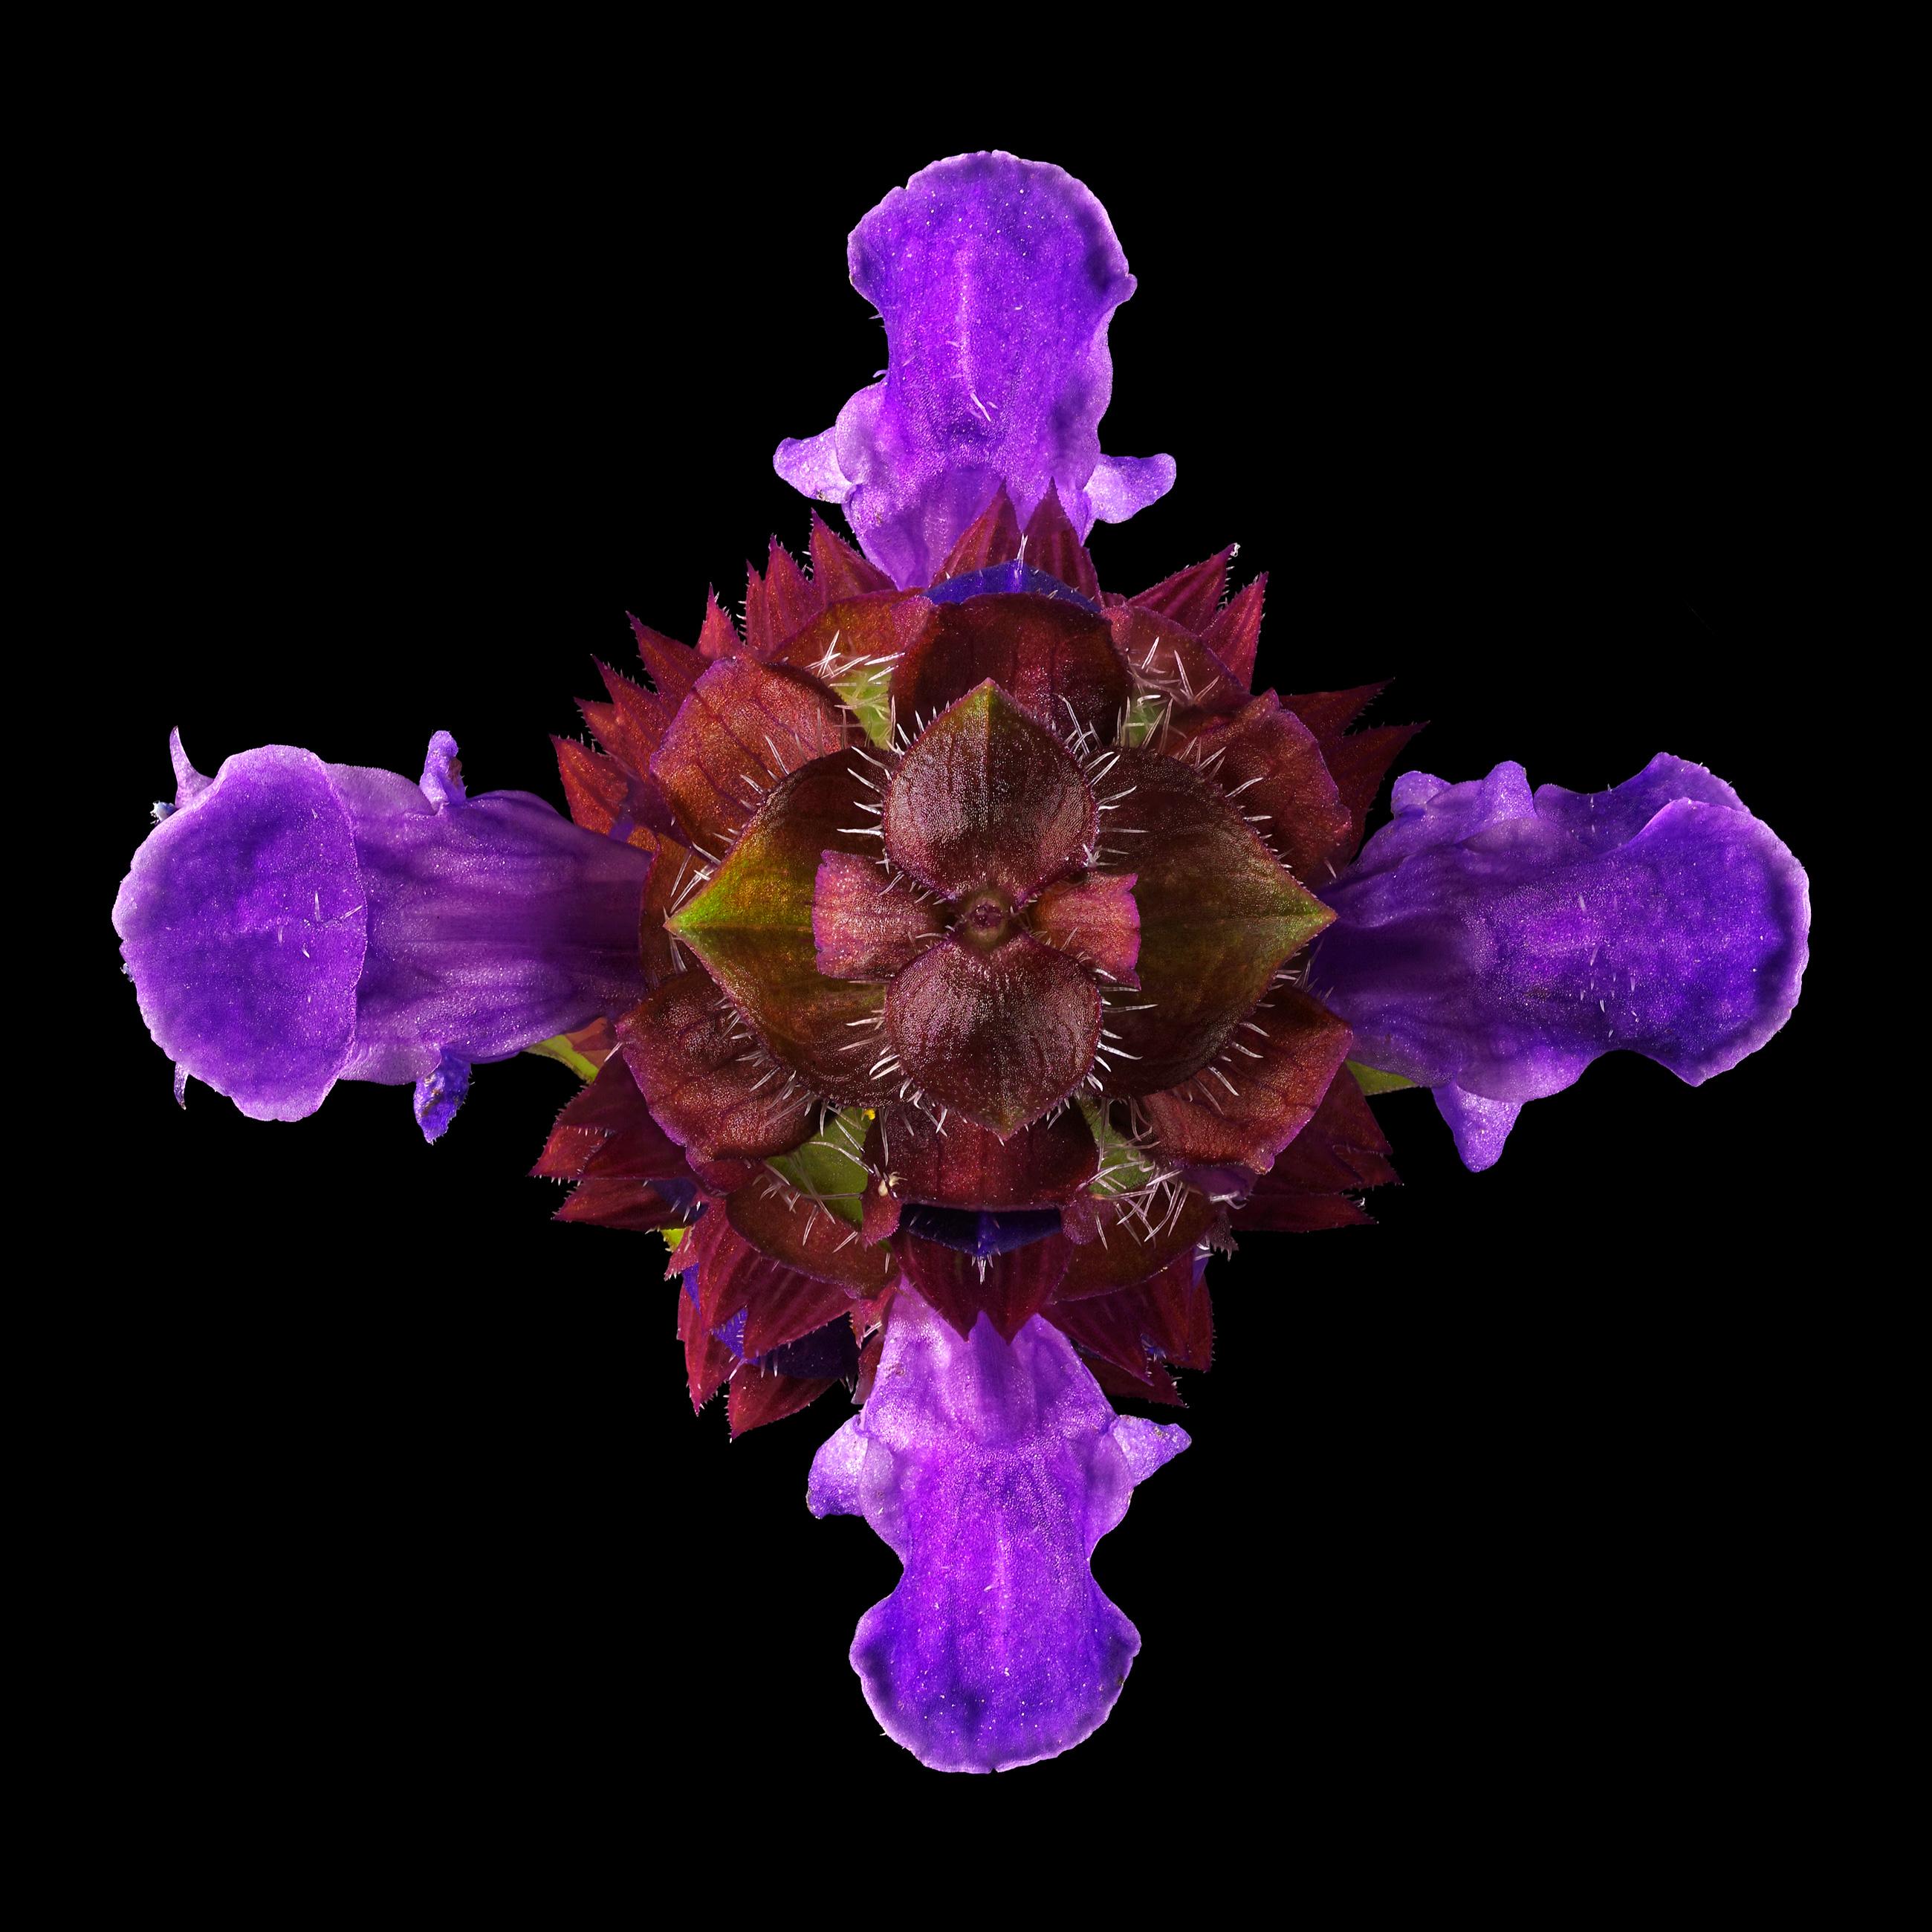 Common self-heal: Prunella vulgaris | Flora obscura